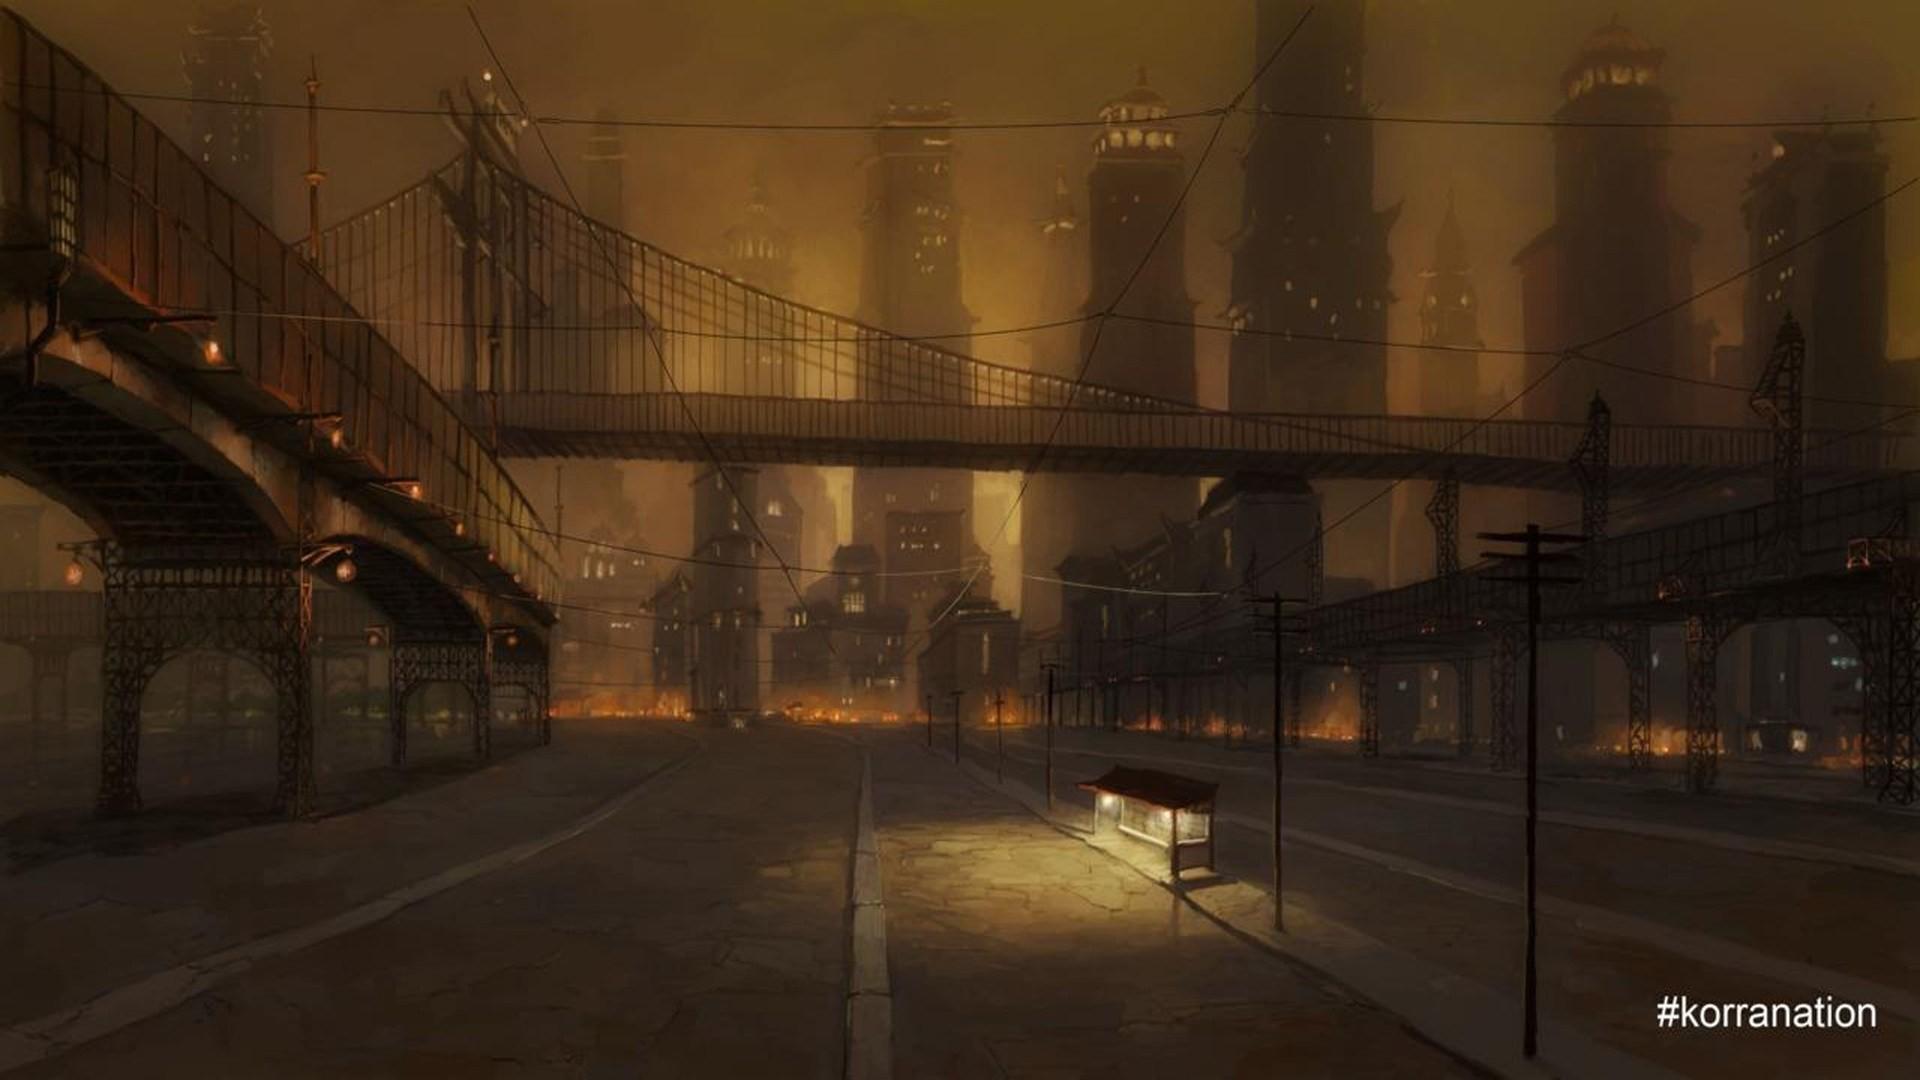 Best Wallpaper Night Evening - night-evening-bridge-The-Legend-of-Korra-Korra-midnight-Republic-City-darkness-screenshot-192719  You Should Have-896525.jpg